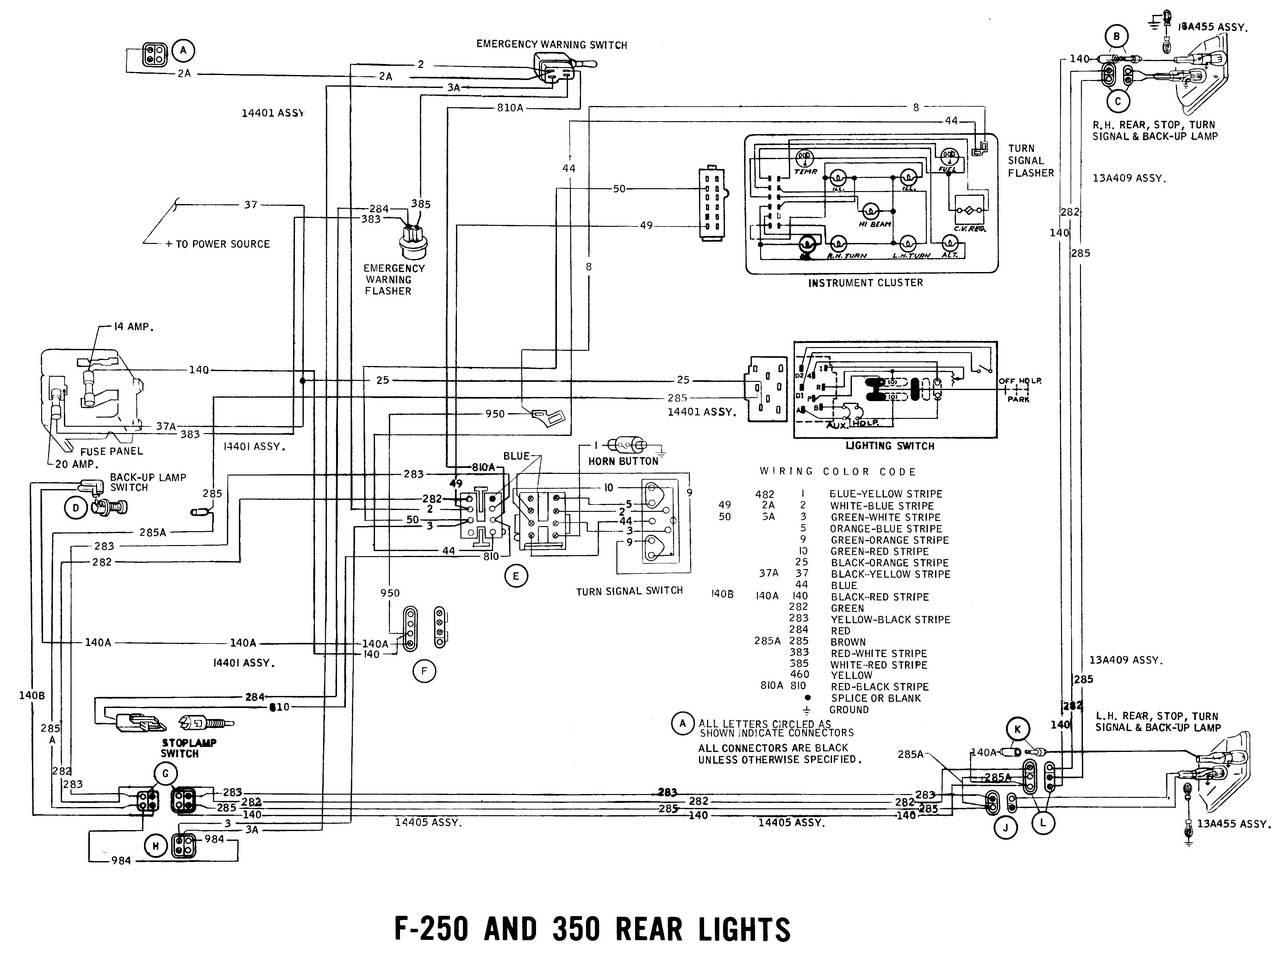 1971 wiring diagrams - Ford Truck Fanatics